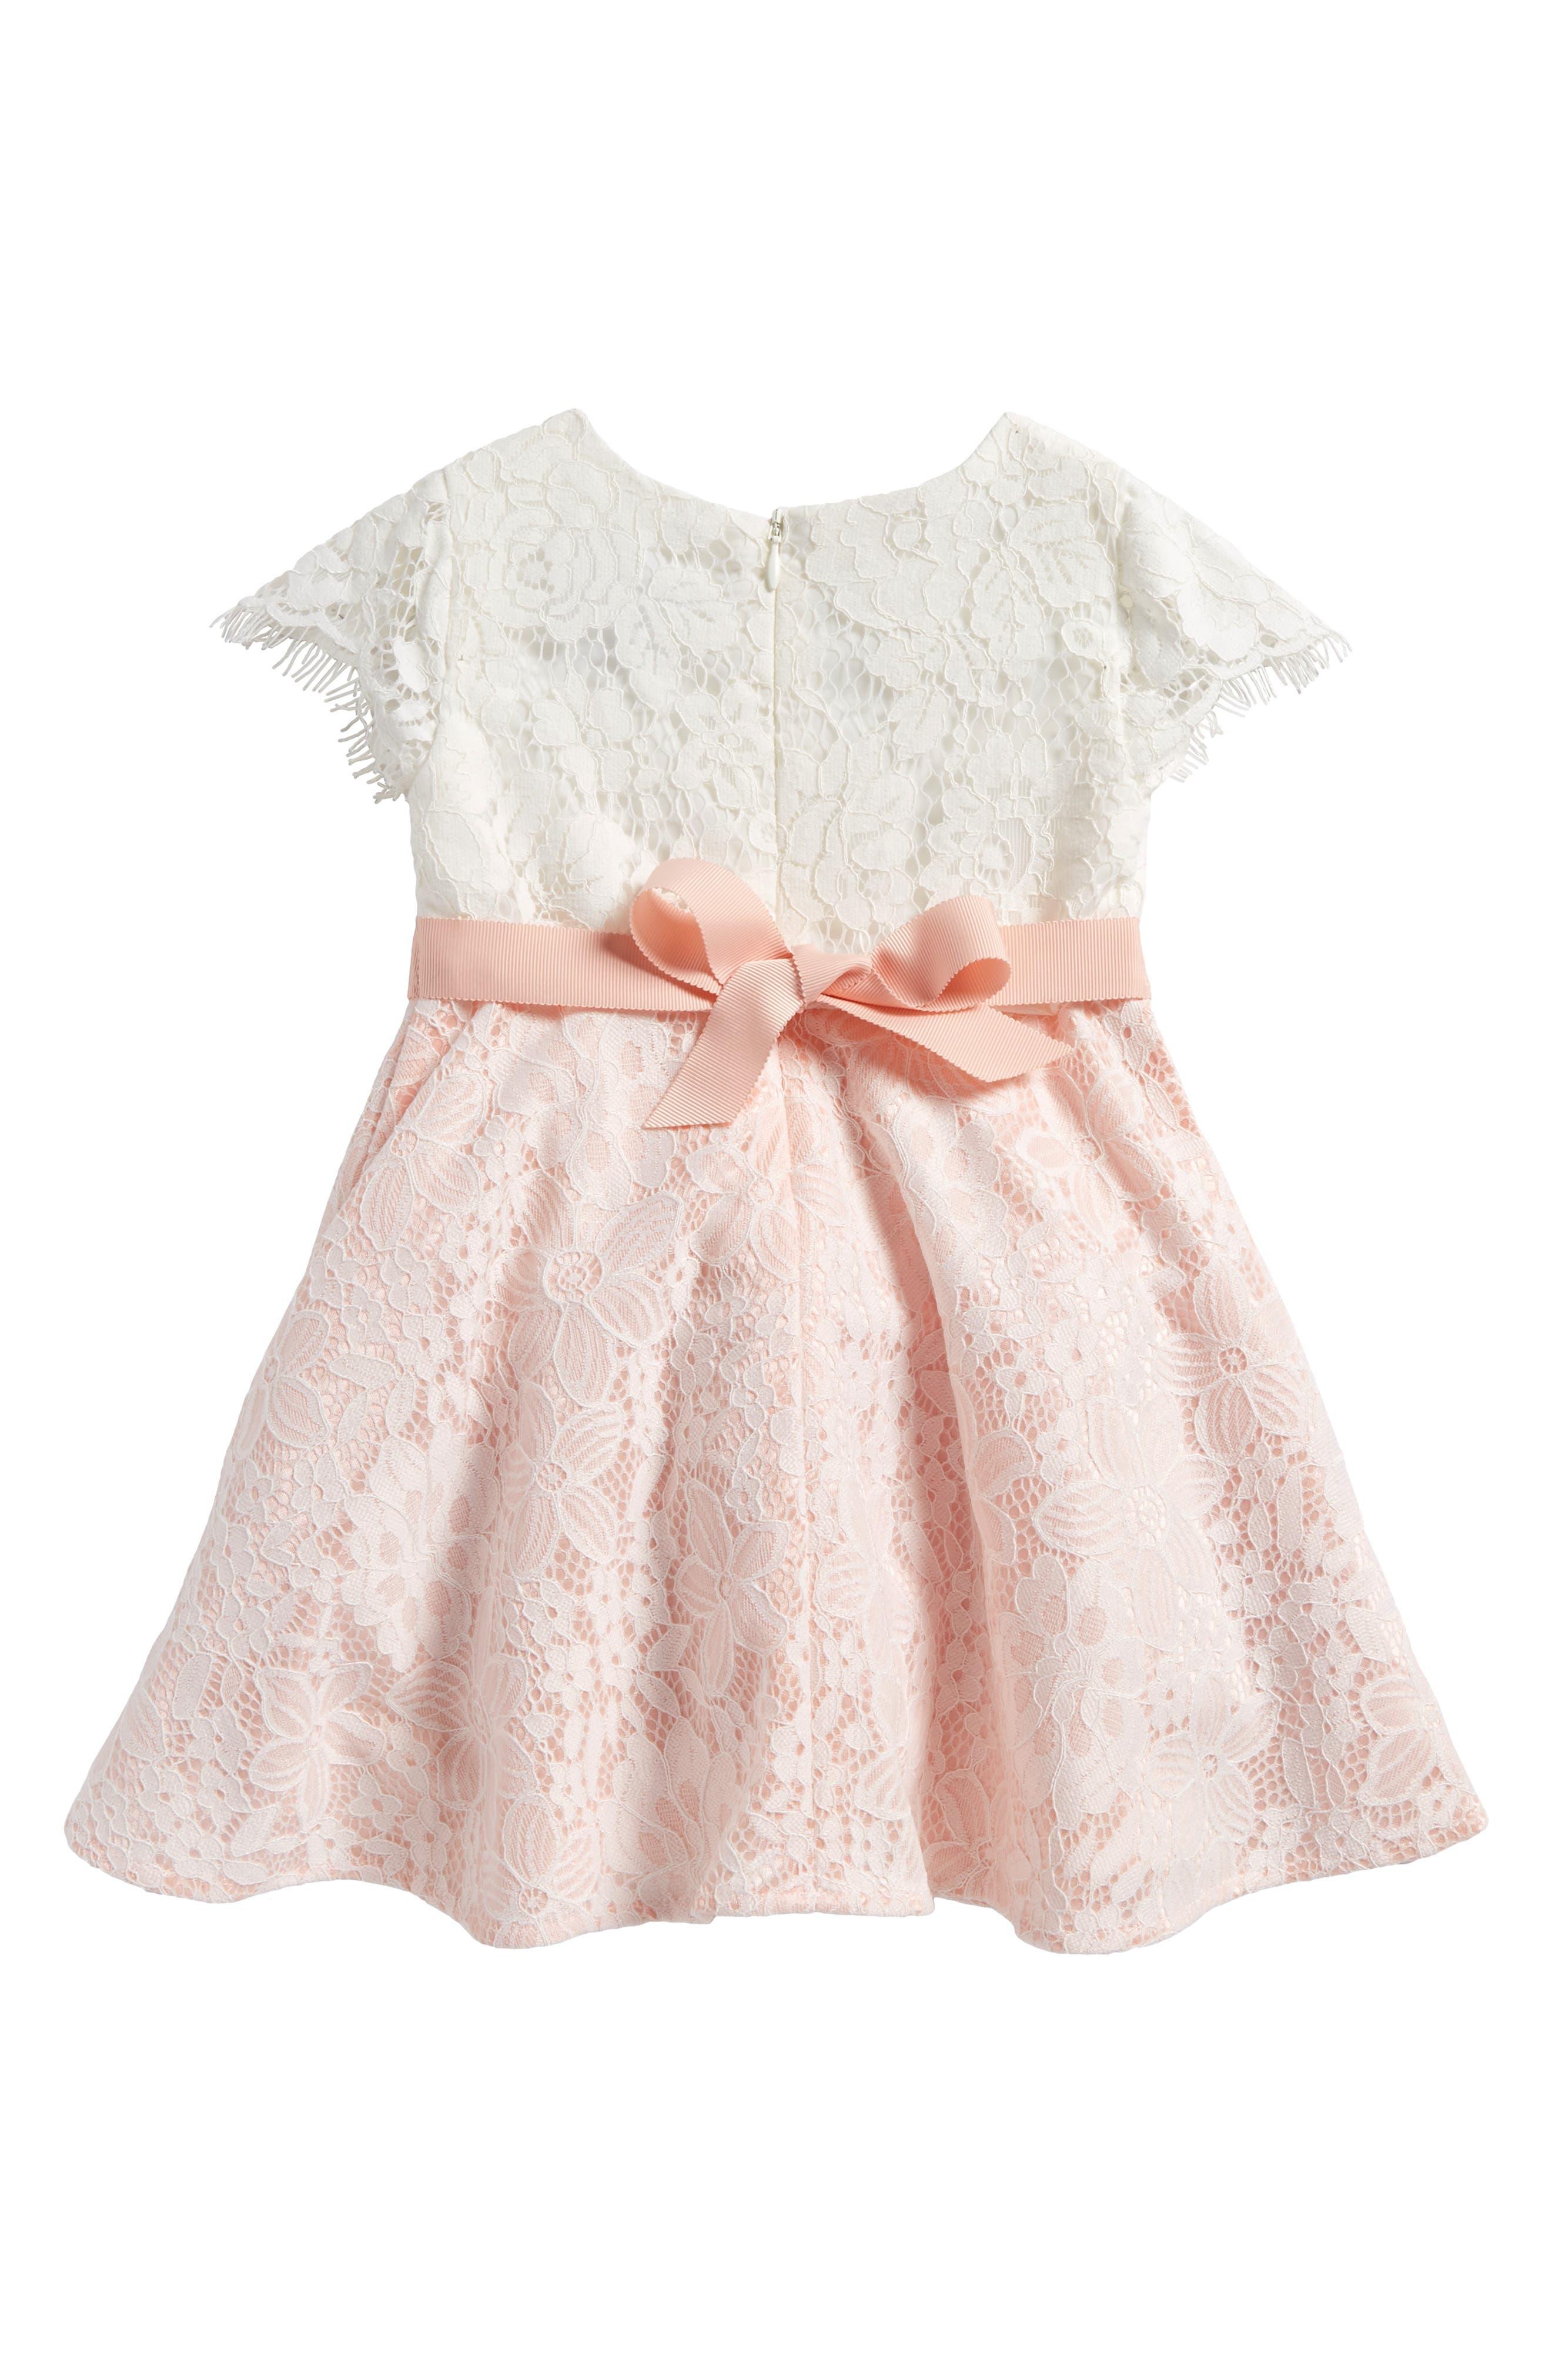 Cap Sleeve Lace Dress,                             Alternate thumbnail 2, color,                             Rosewater